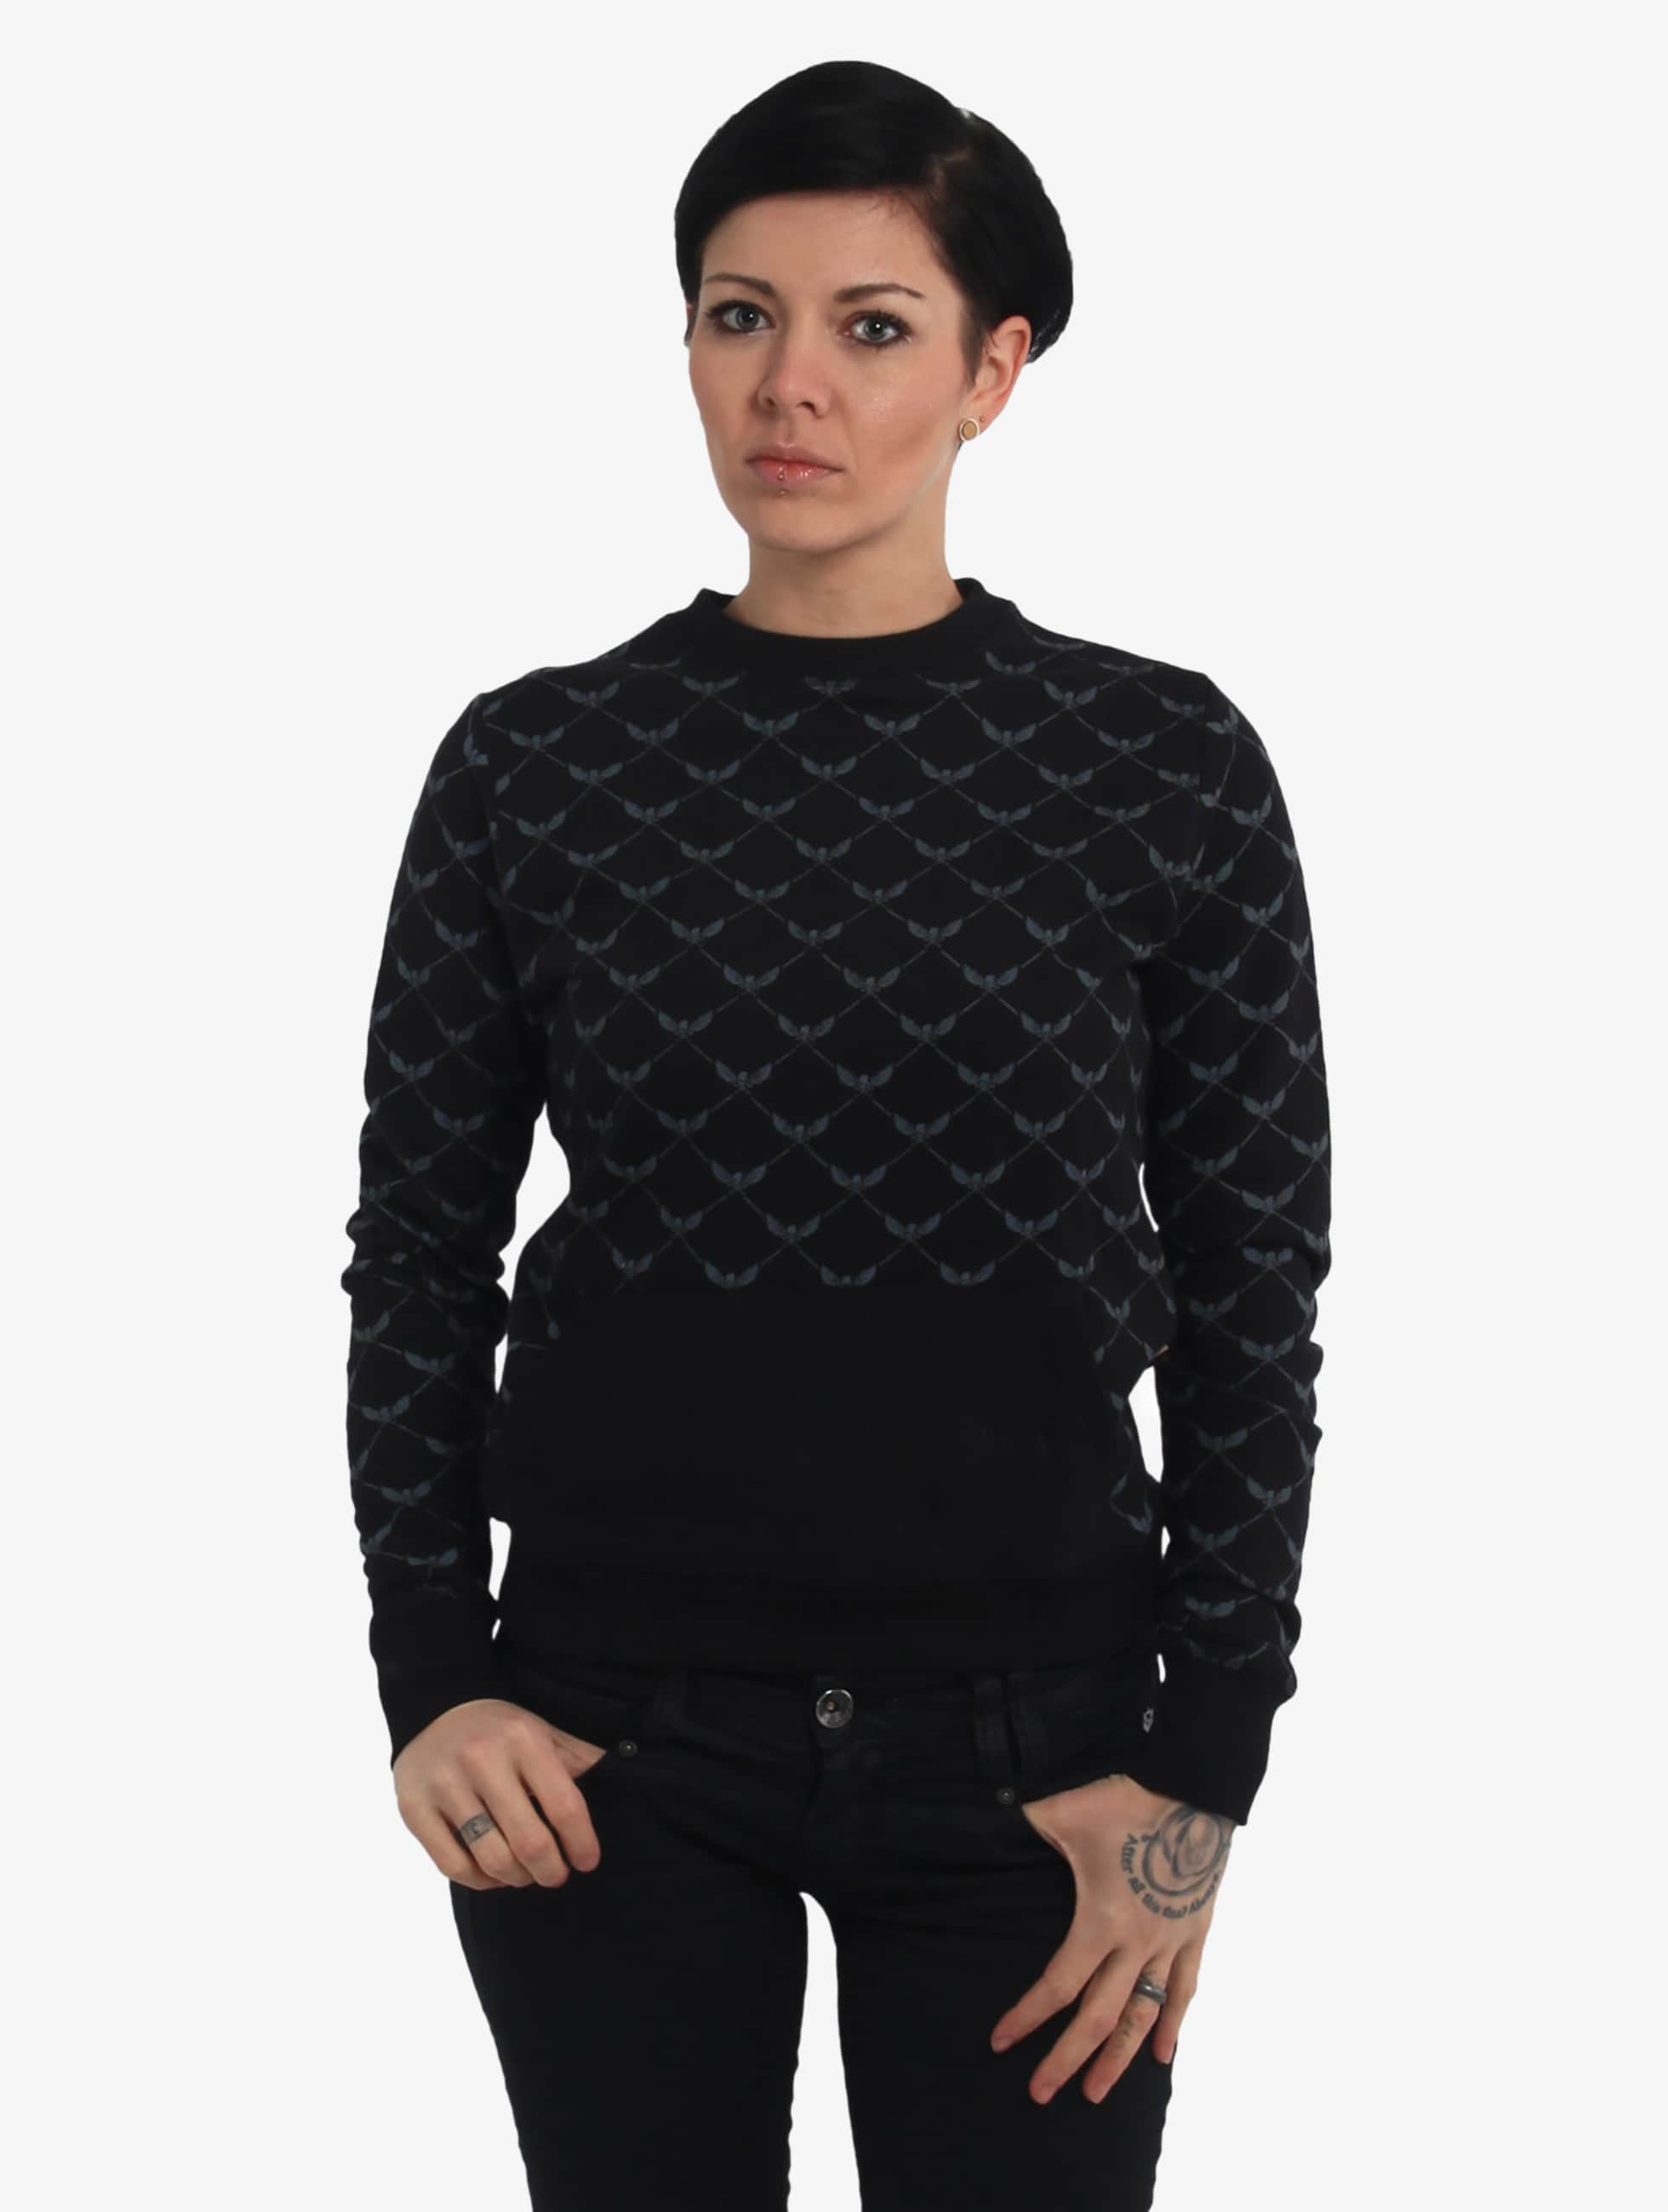 Yakuza Memento Mori Pouch Sweatshirt Black